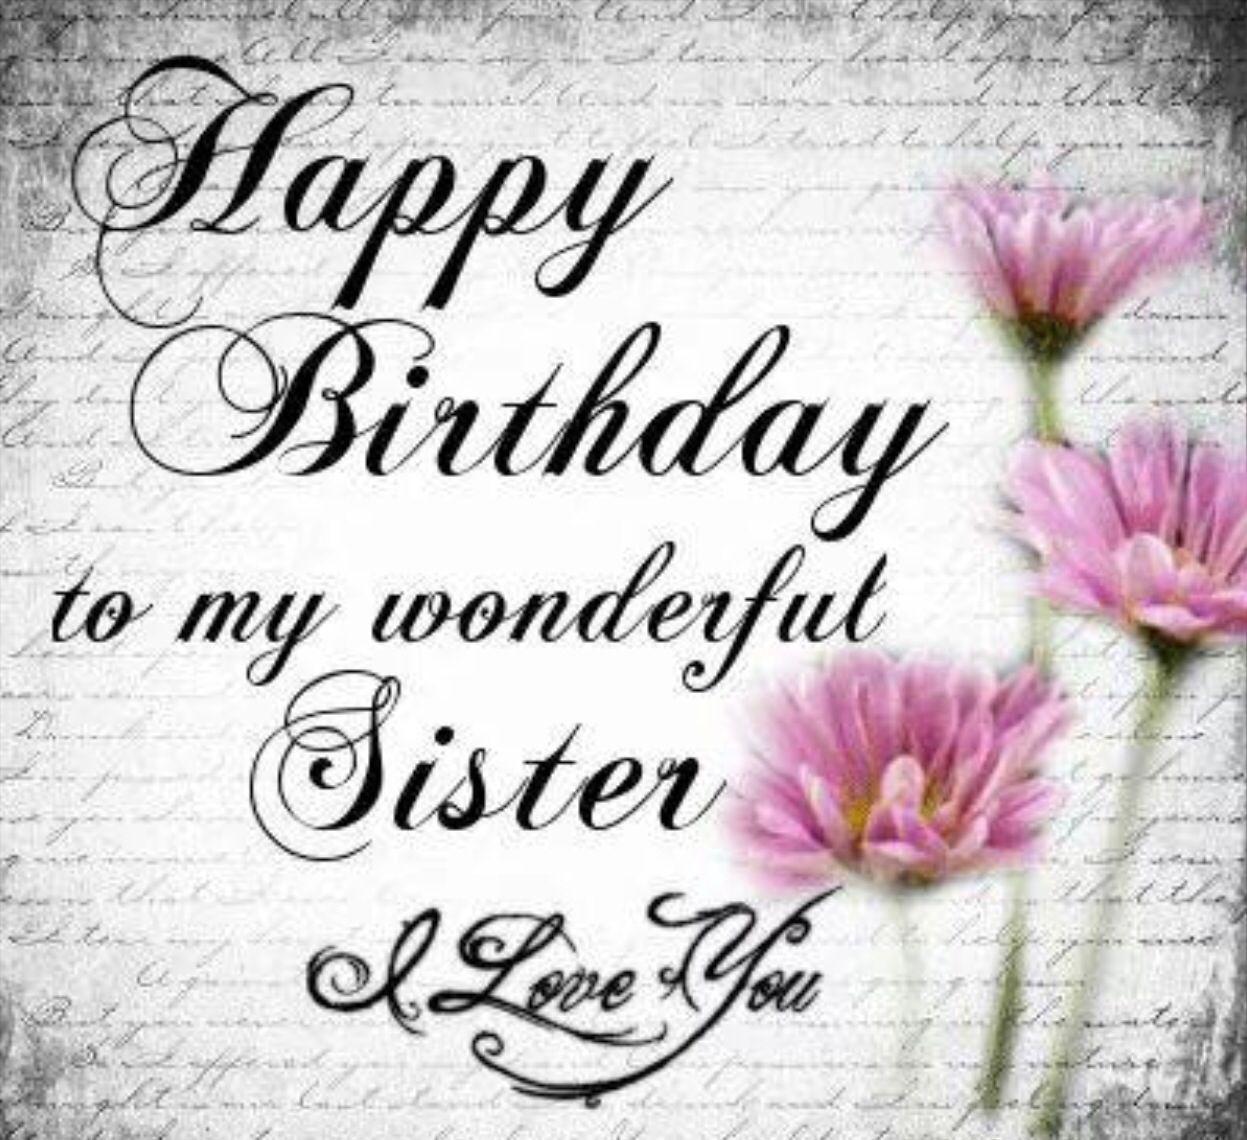 Pin By Rosa Galvan On Birthday Happy Birthday Pictures Birthday Blessings Happy Birthday Sis